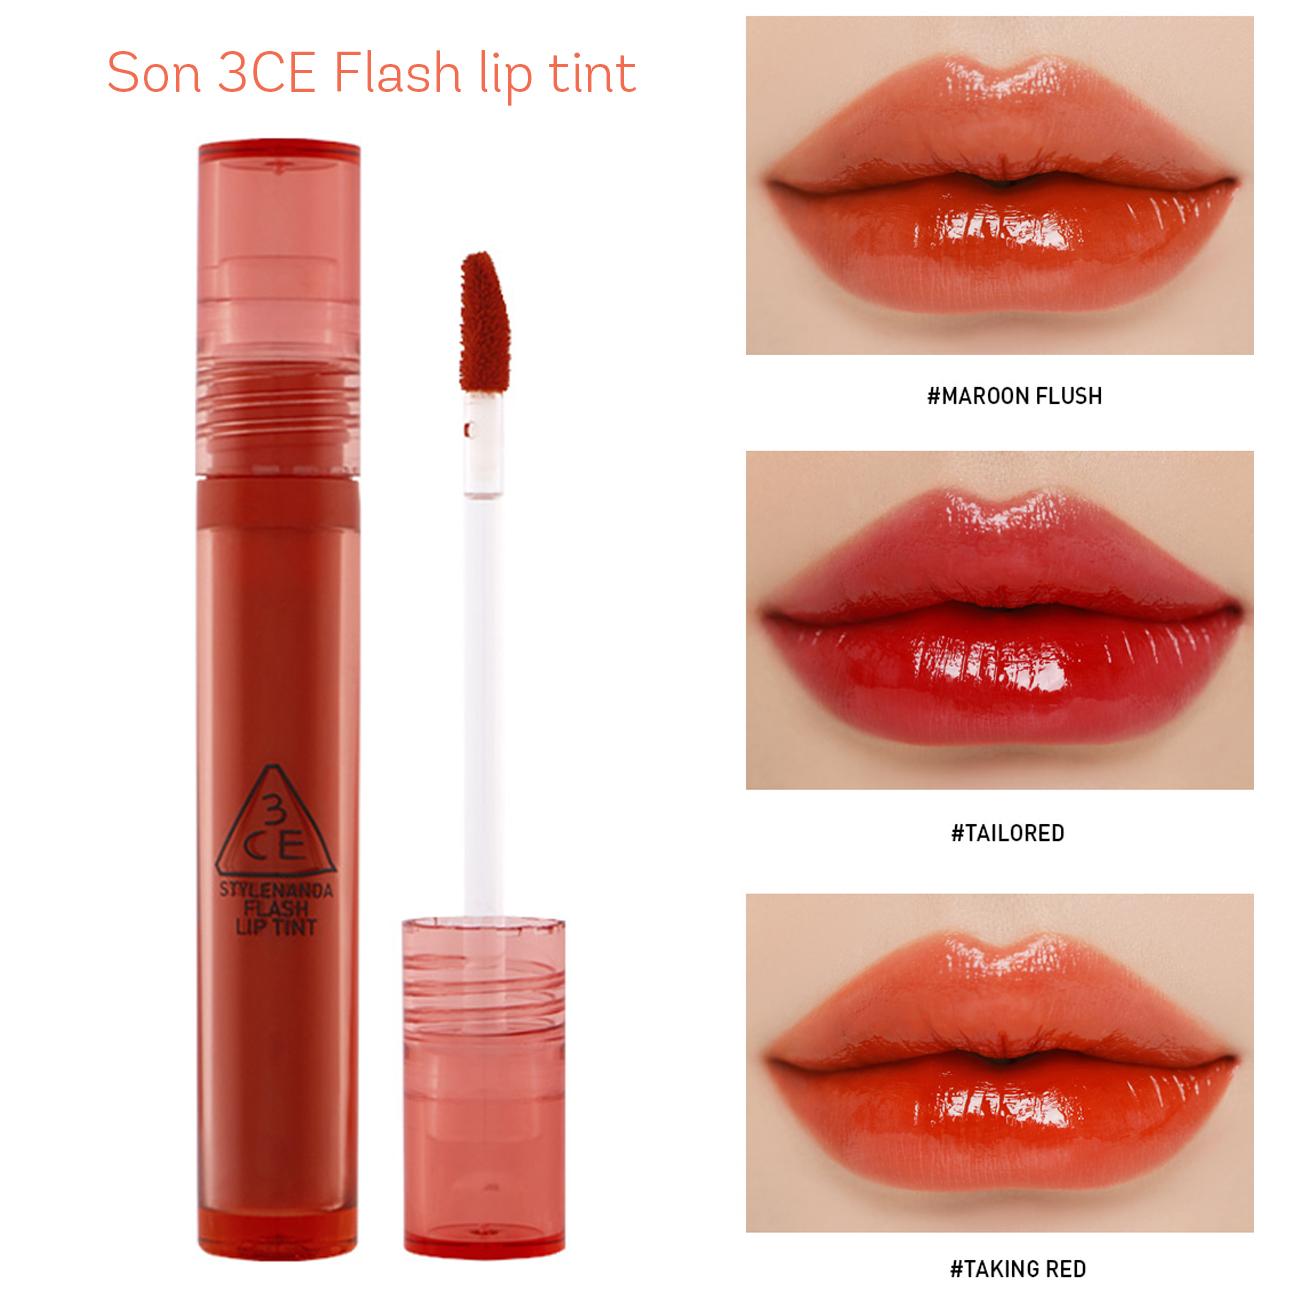 Son Tint 3CE Flash Lip Tint